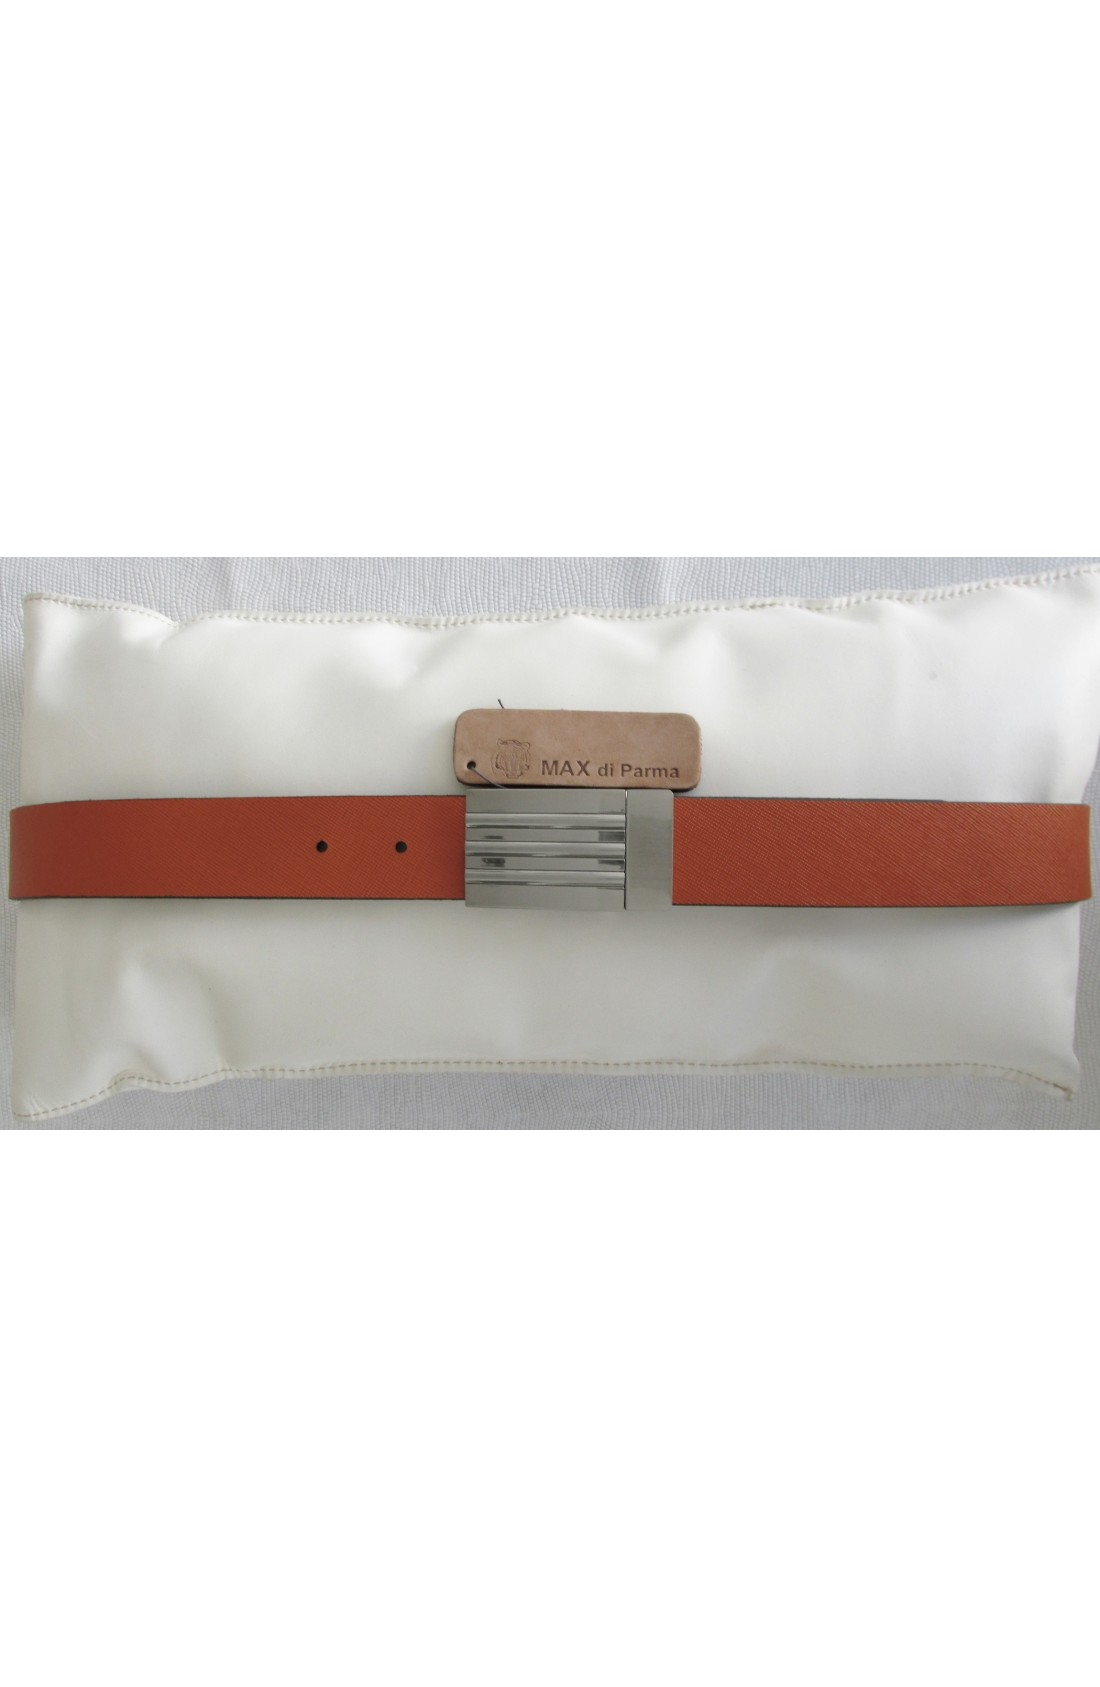 art. 842 LINEA REVERSIBILE mm.35 DAKAR var.103 nocciola + SAFFIANO var.8 arancione Placca reversibile girevole Y 03 mm.35 nikel free satinato (2)